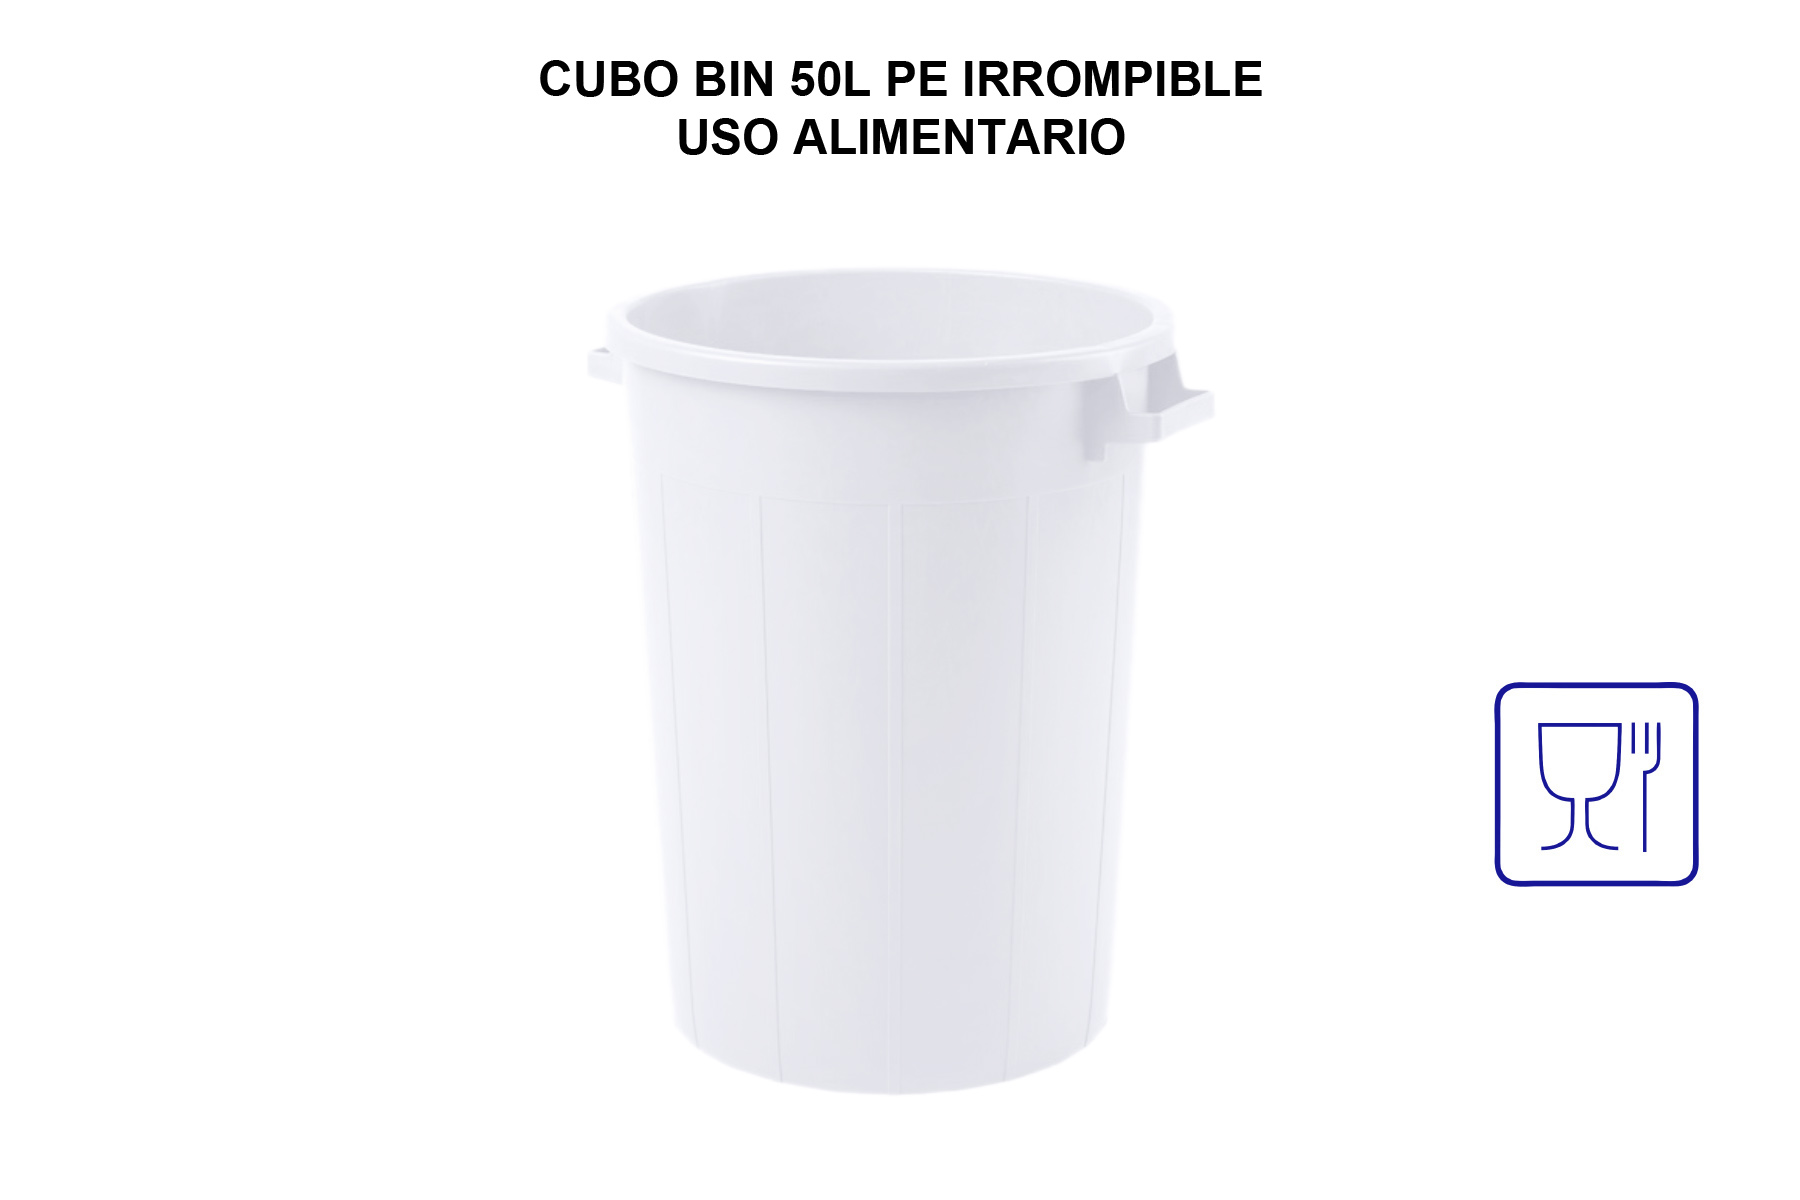 CUBO BIN 50L PE IRROMPIBLE USO ALIMENTARIO